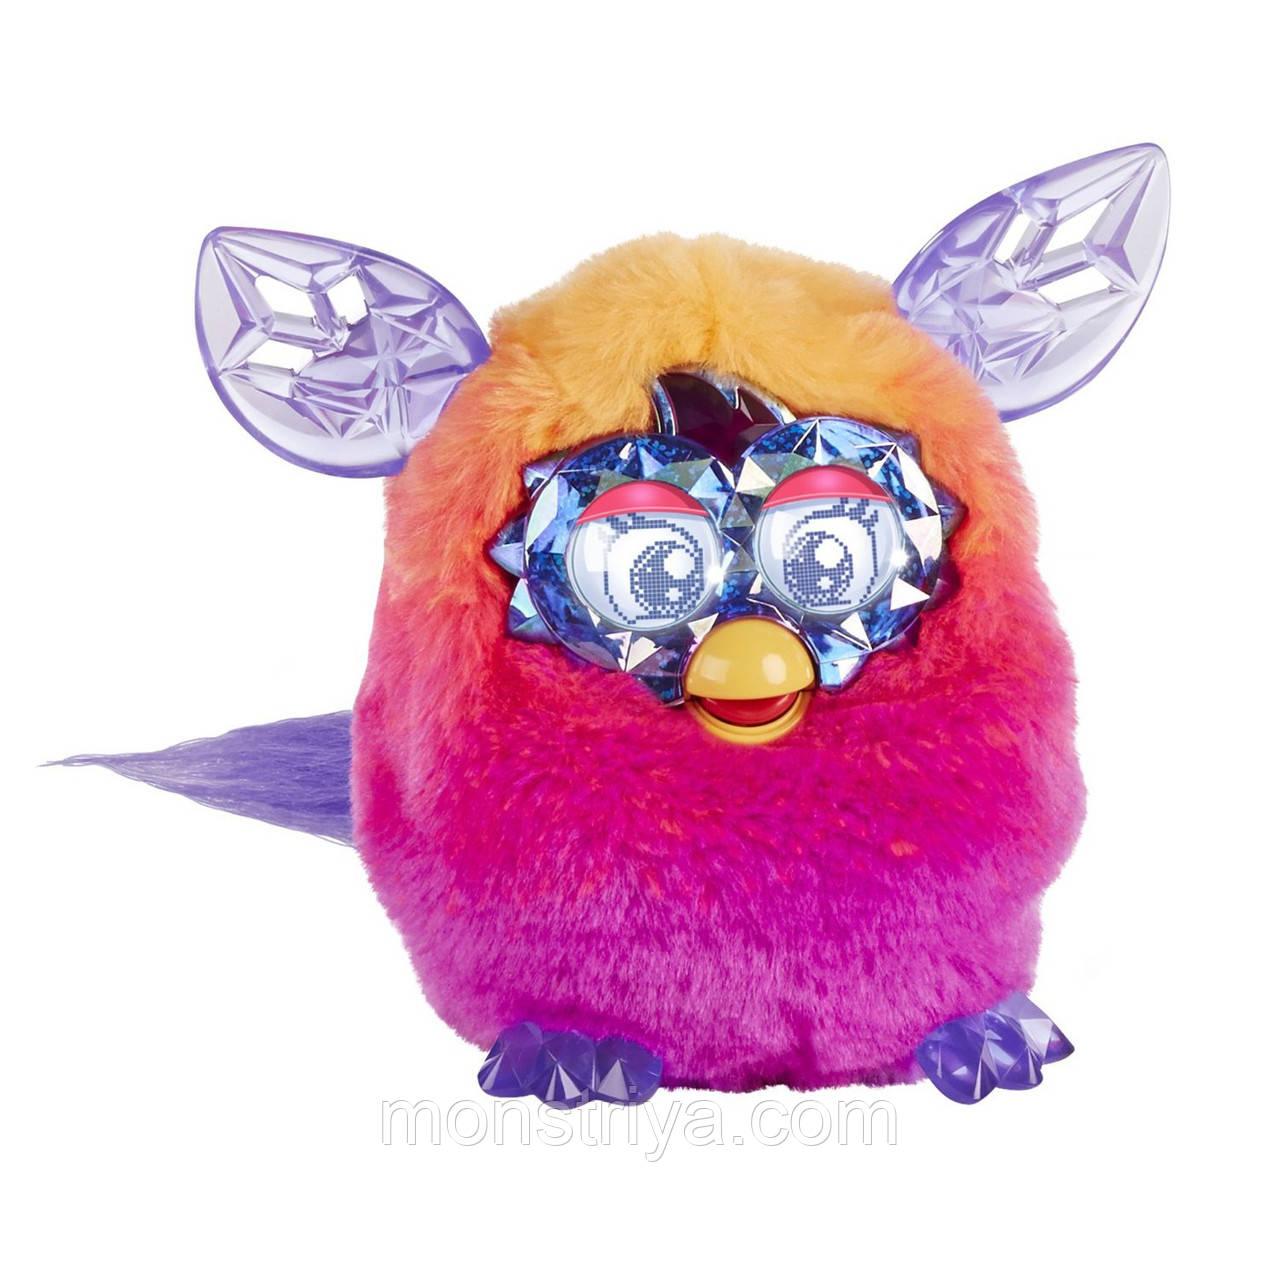 Furby Boom Crystal Series, Фёрби Кристал. Ферби Бум Интерактивная игрушка